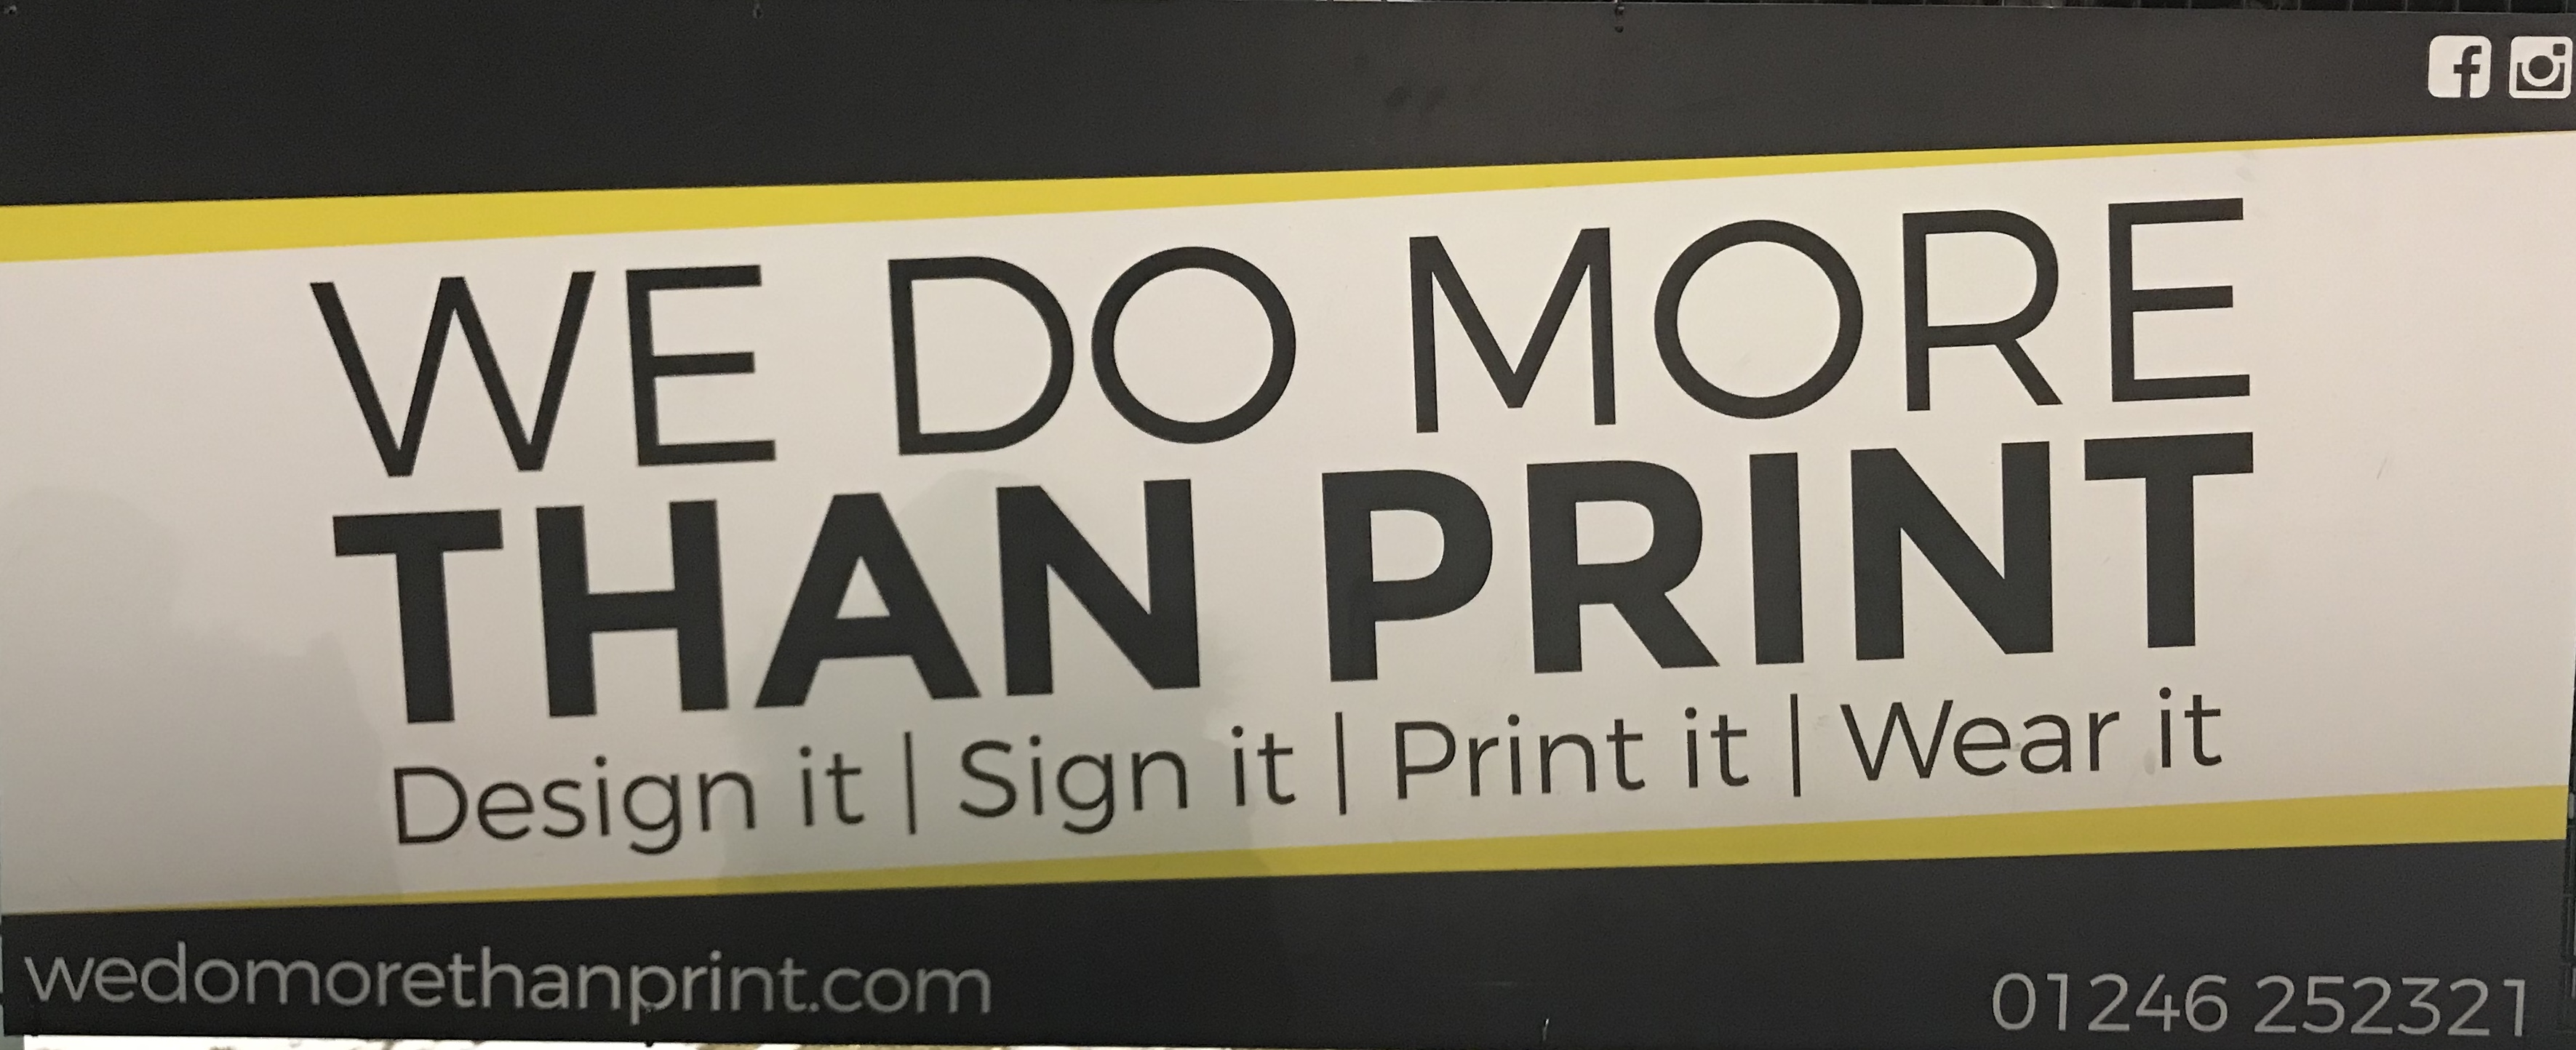 We Do More Than Print